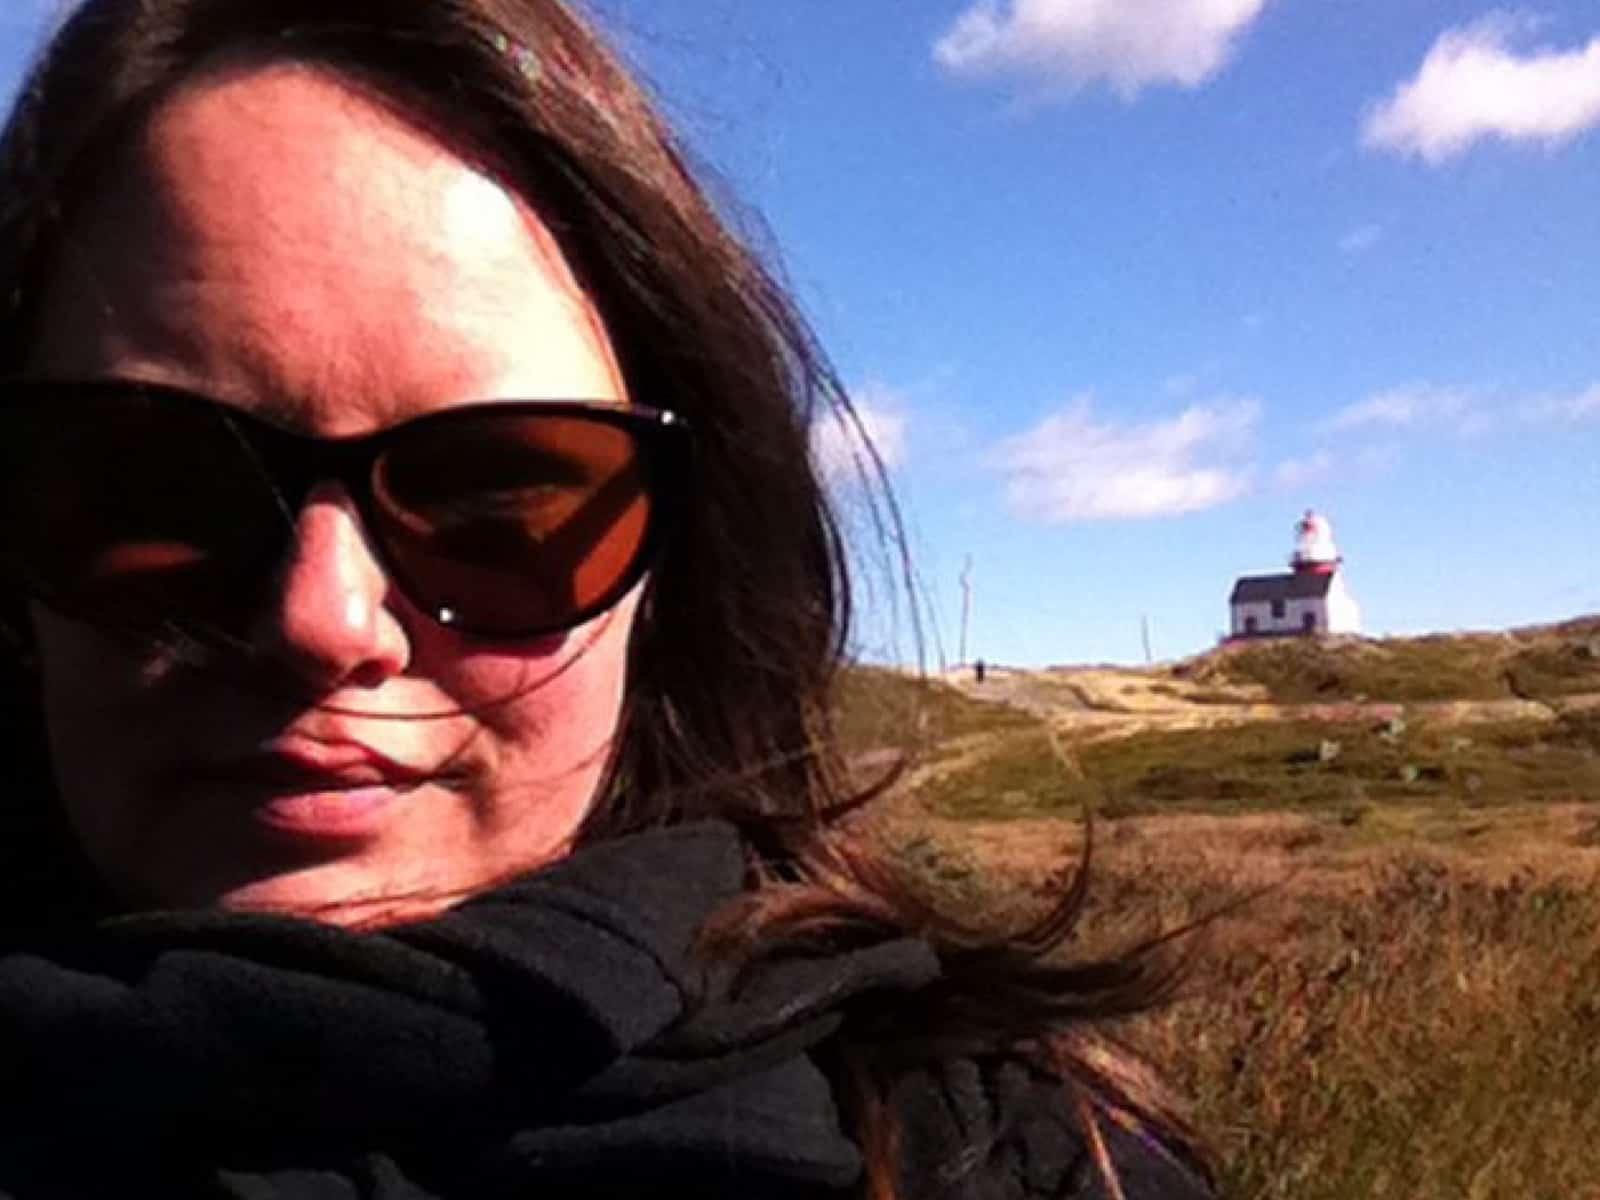 Melanie from St. John's, Newfoundland and Labrador, Canada